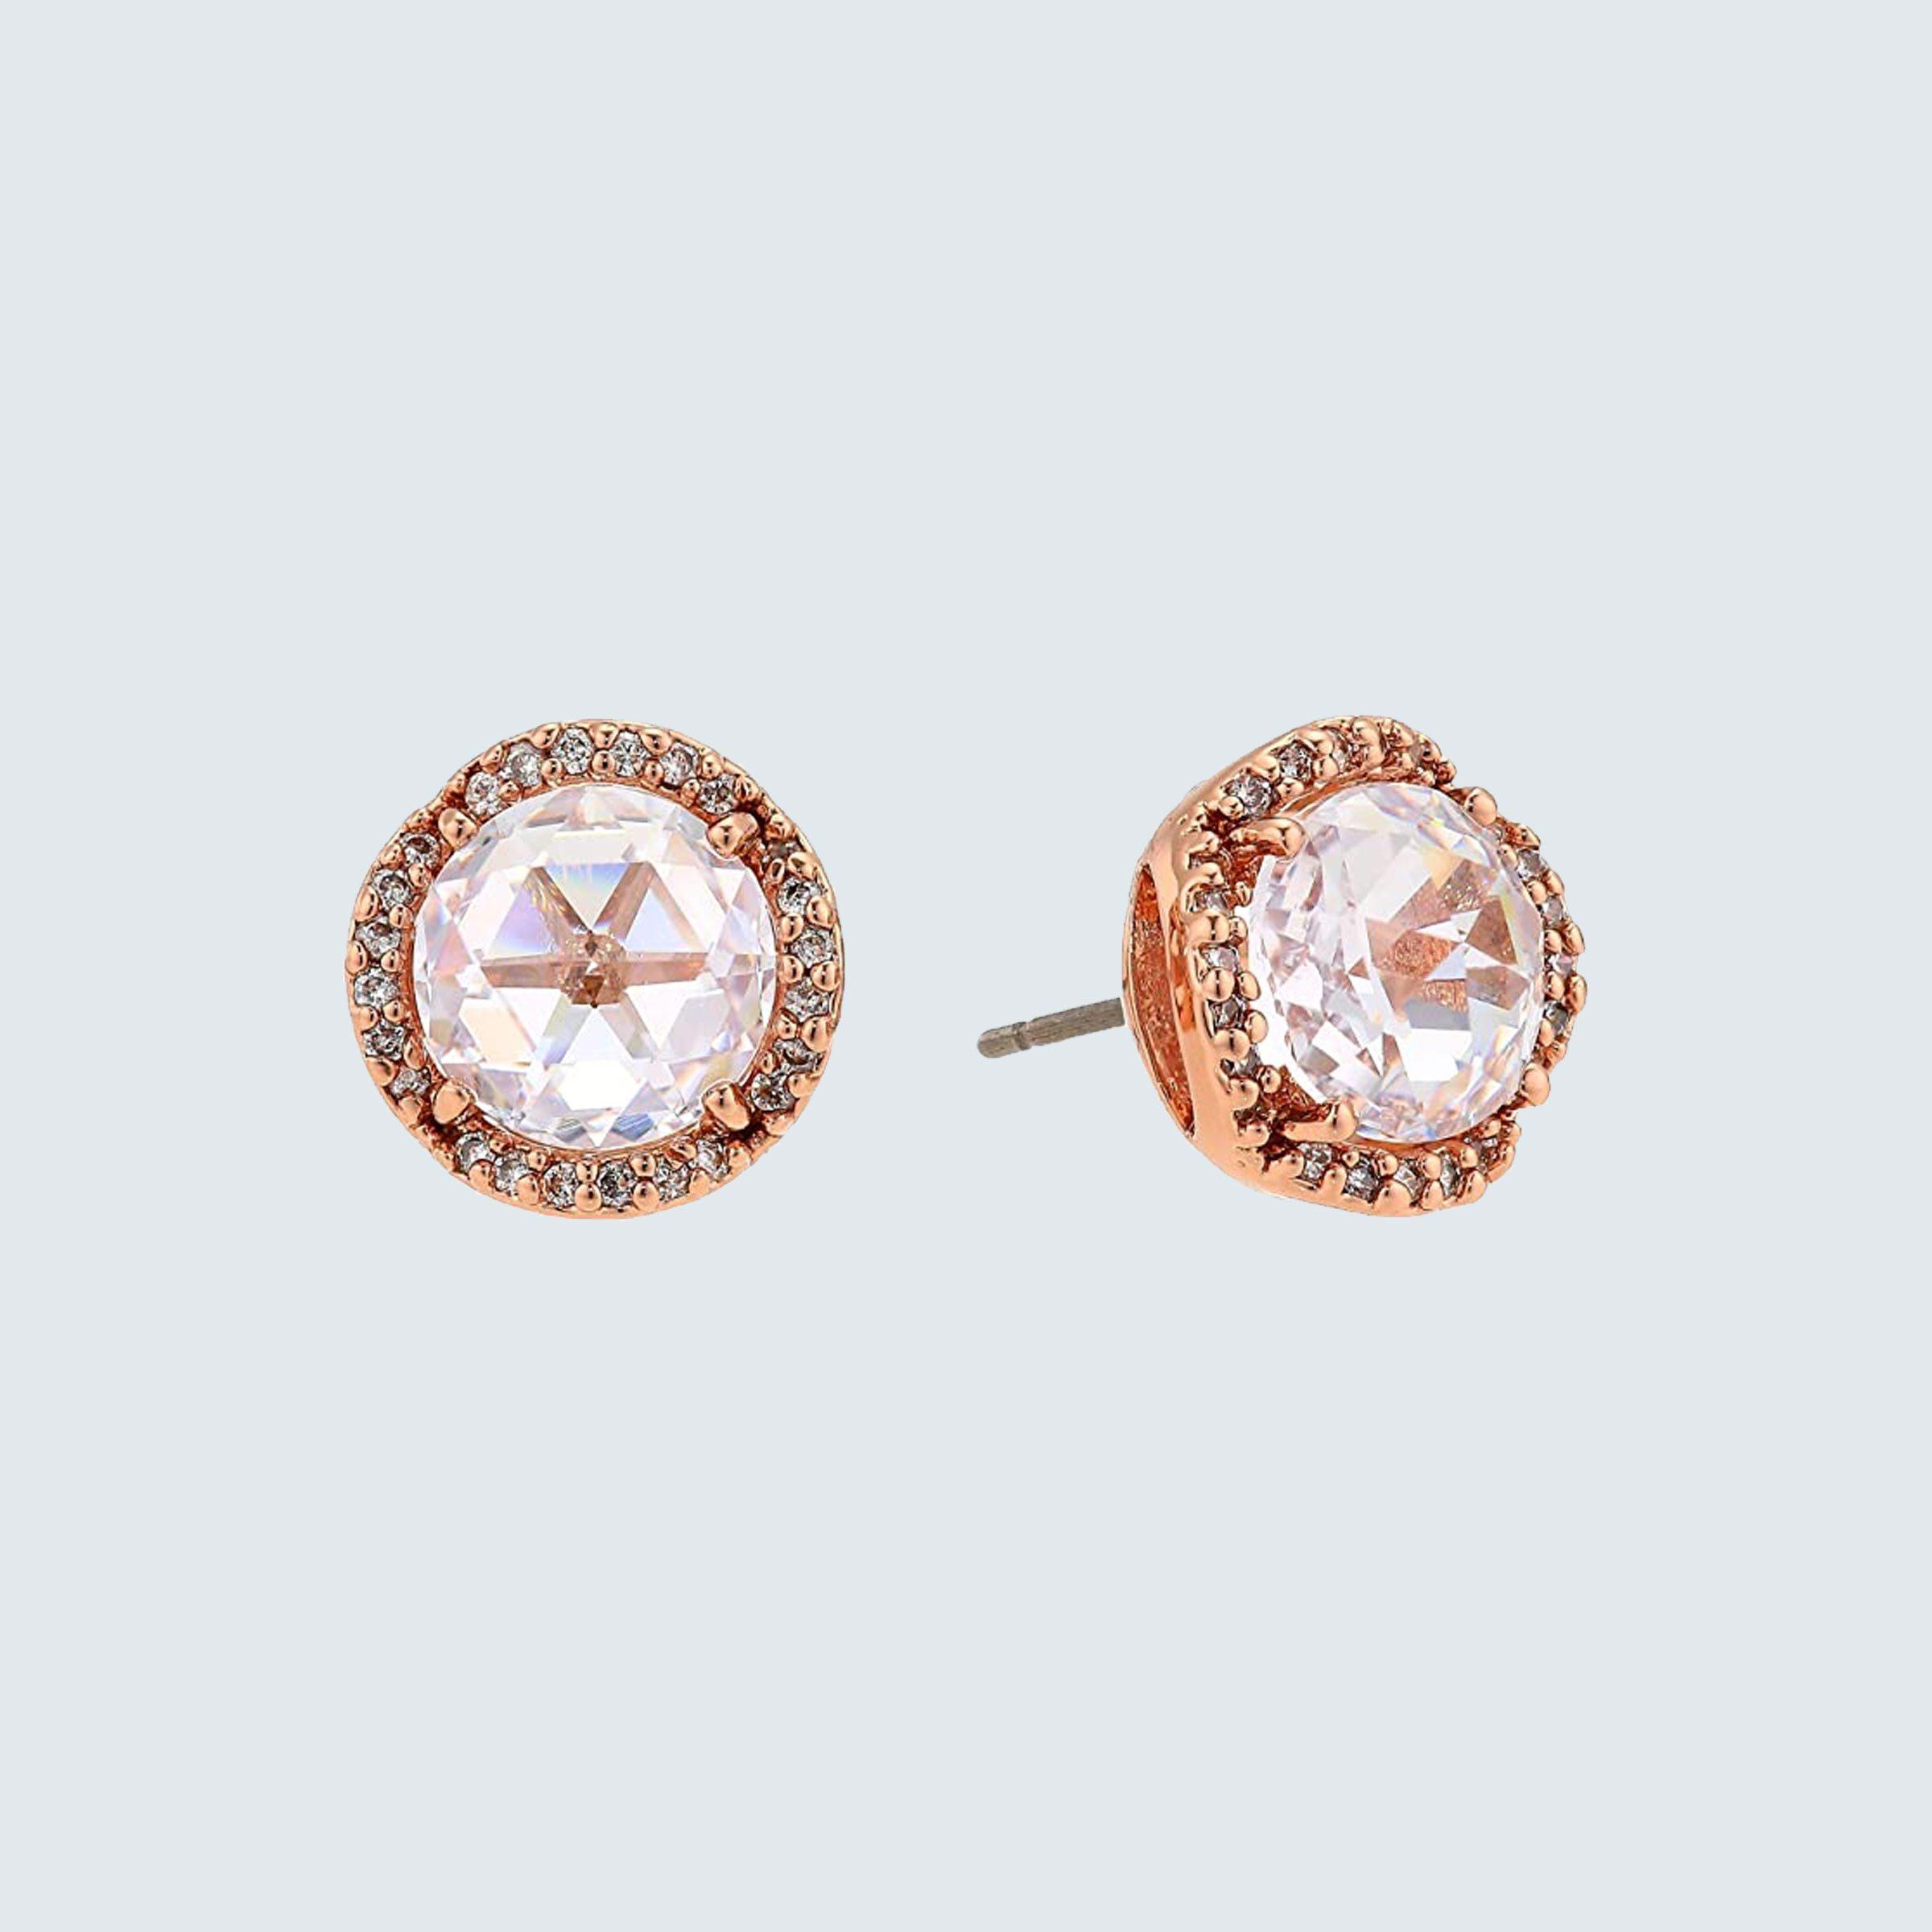 Kate Spade New York That Sparkle Pavé Stud Earrings